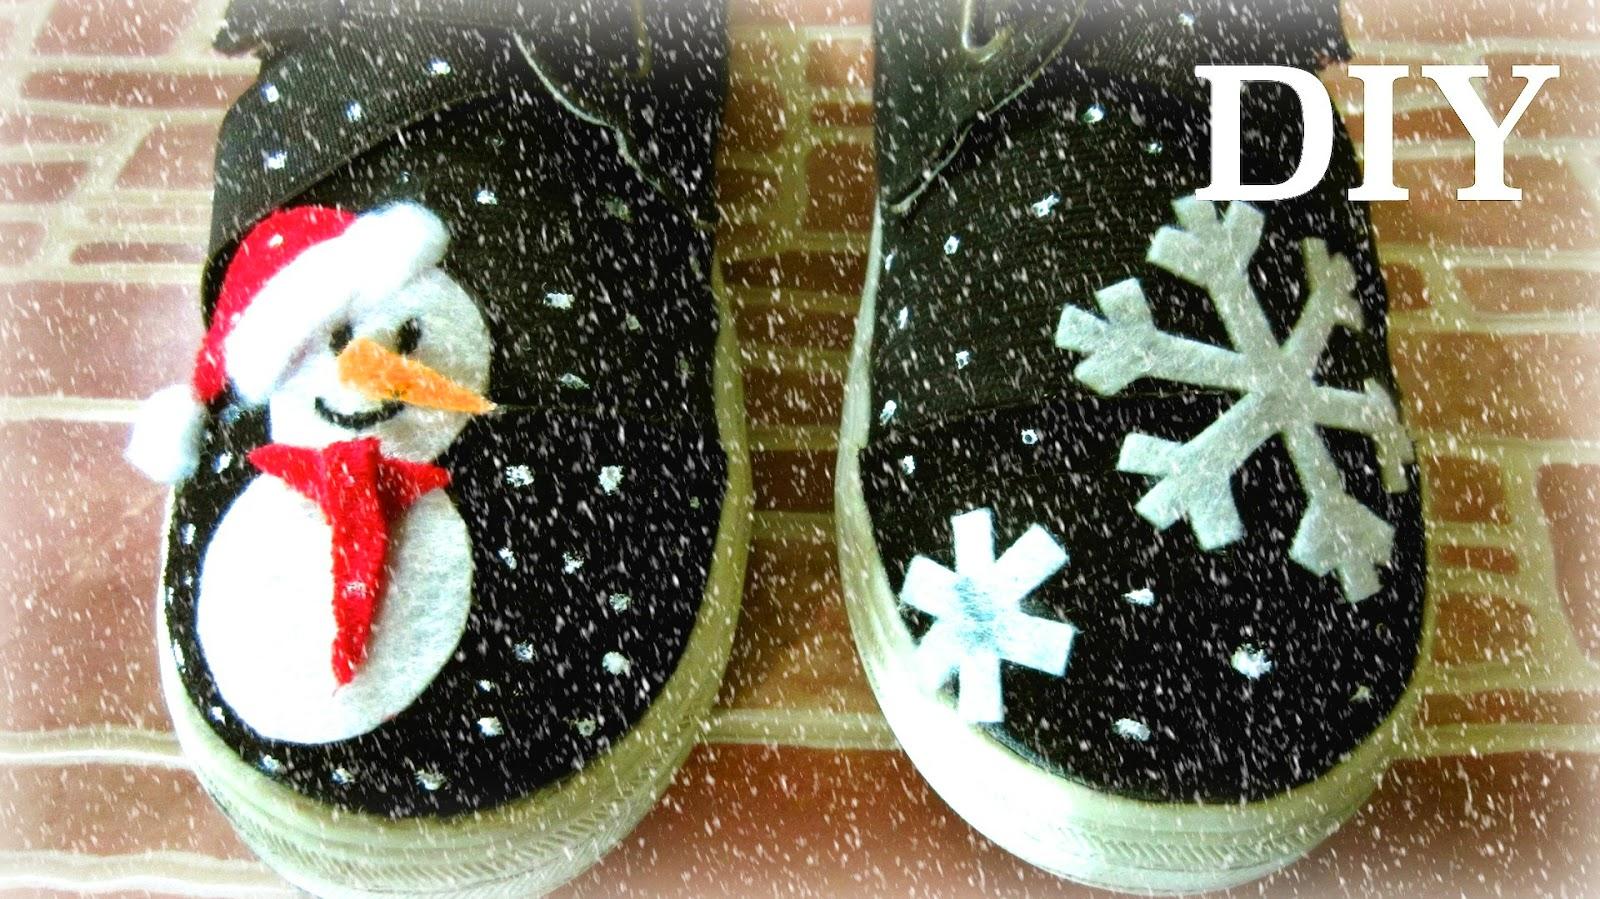 Christmas Shoes Diy.Aira Tran Diy Snowman Shoes Diy Christmas Gifts